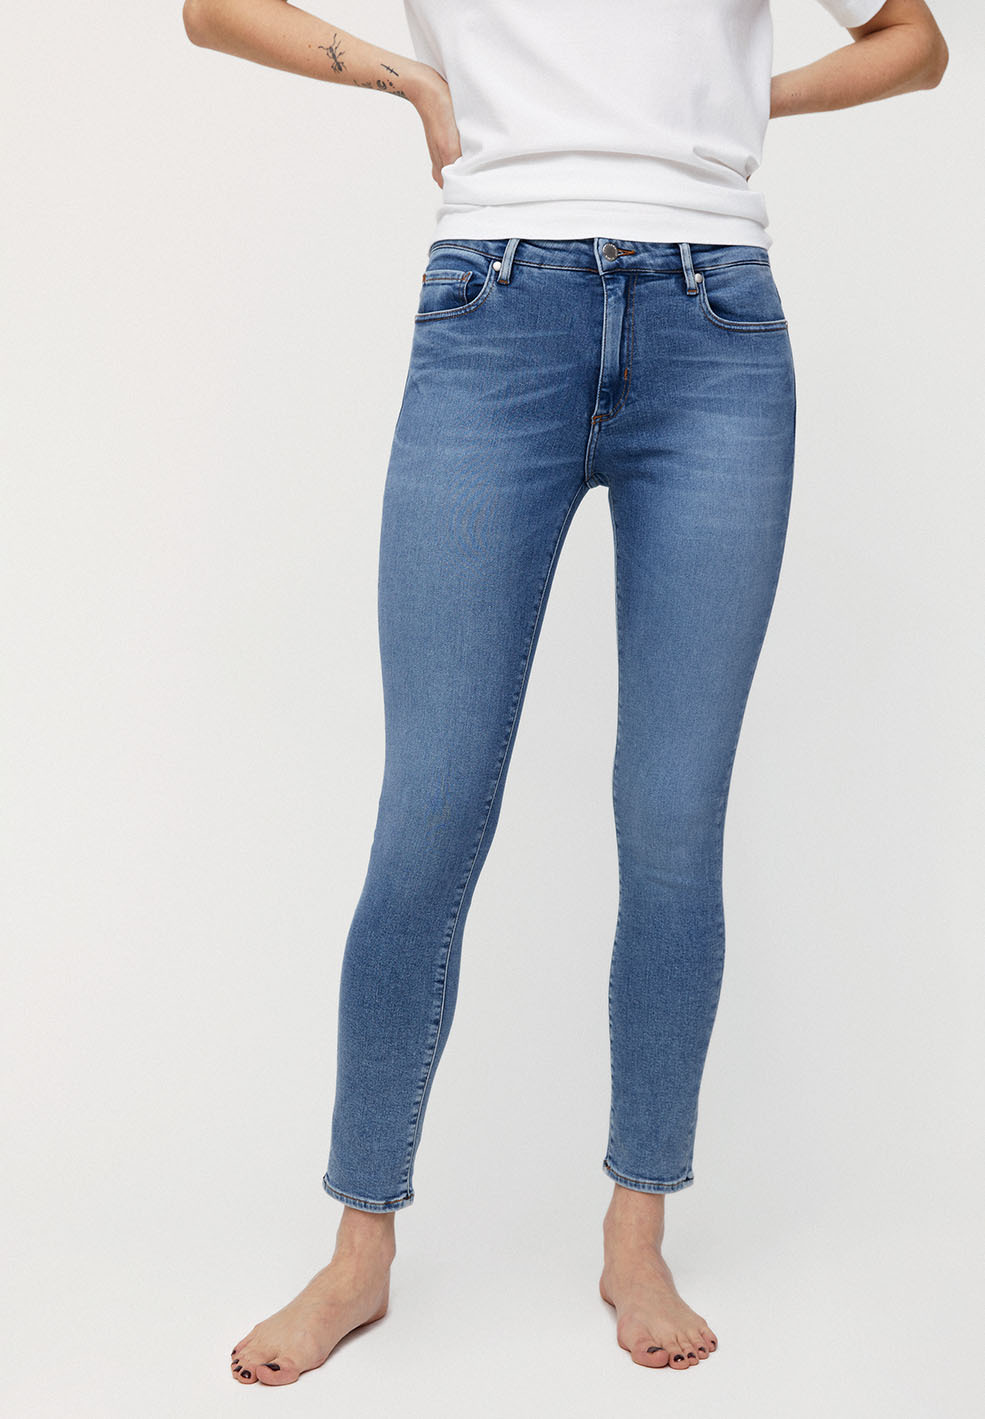 ARMEDANGELS-TILLAA-X-STRETCH-Jeans-sky-blue